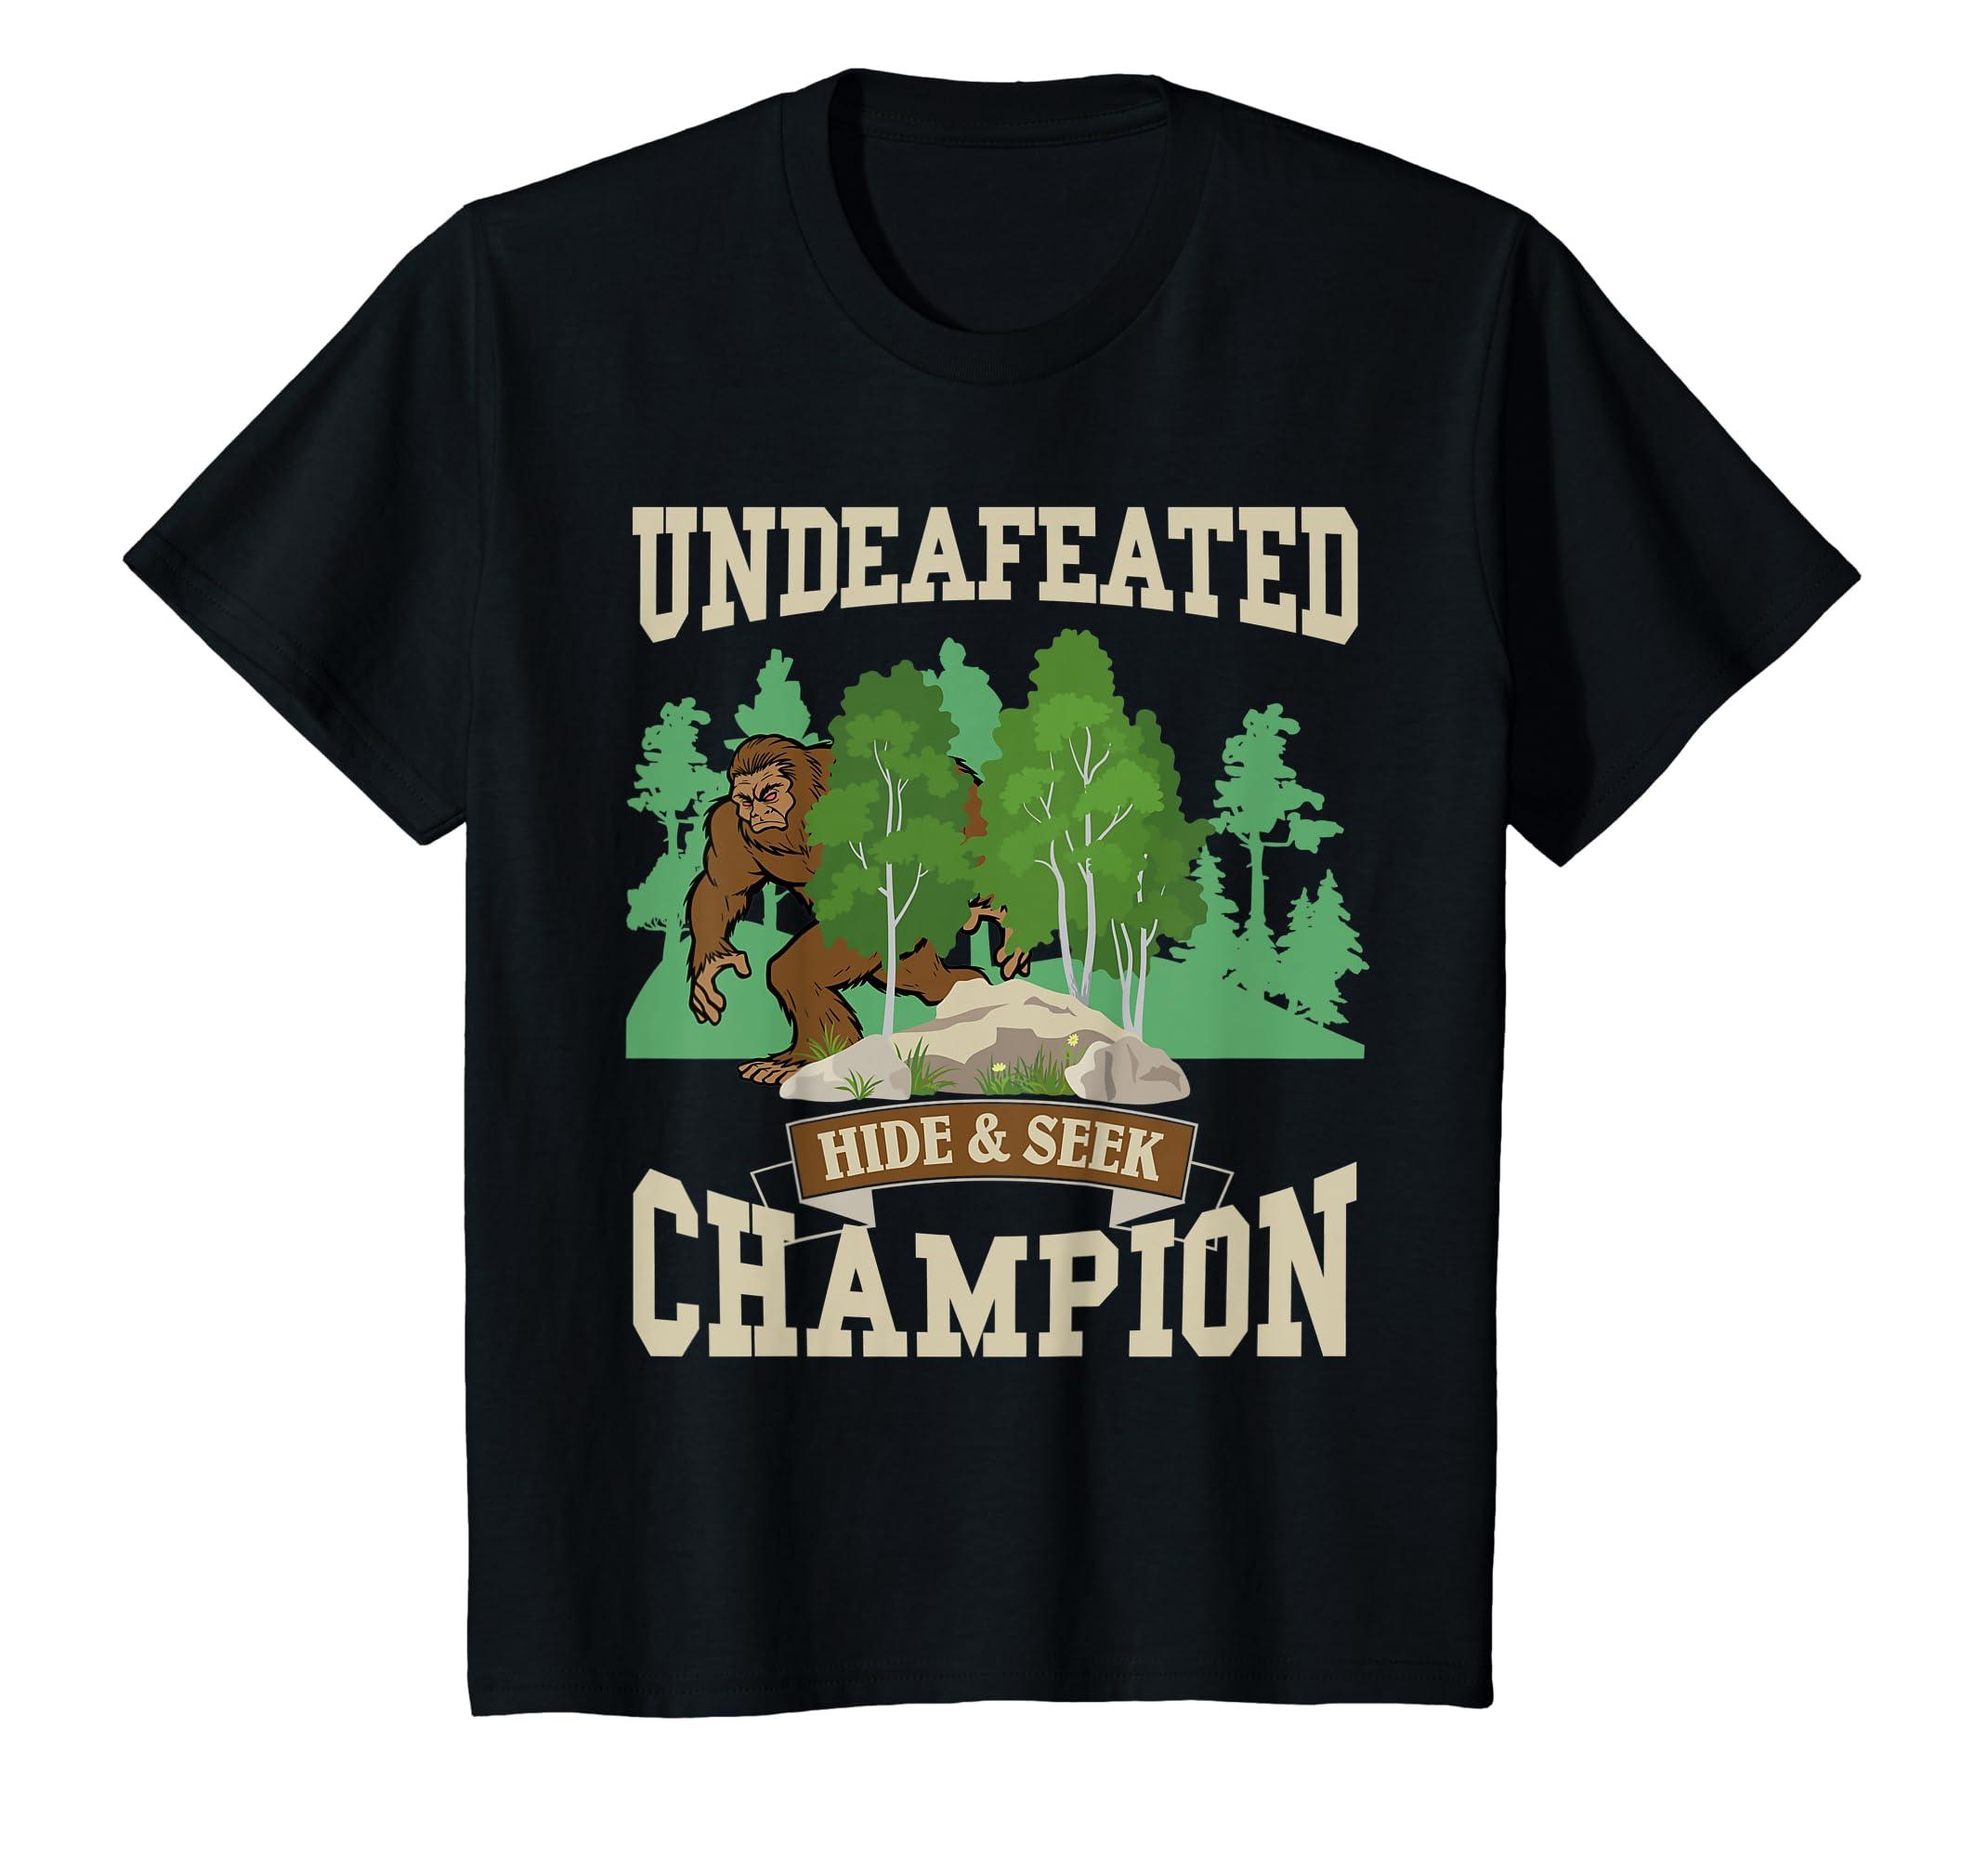 42fd1bc4 Amazon.com: Funny Bigfoot Yeti Undefeated Hide & Seek Champion T-Shirt:  Clothing